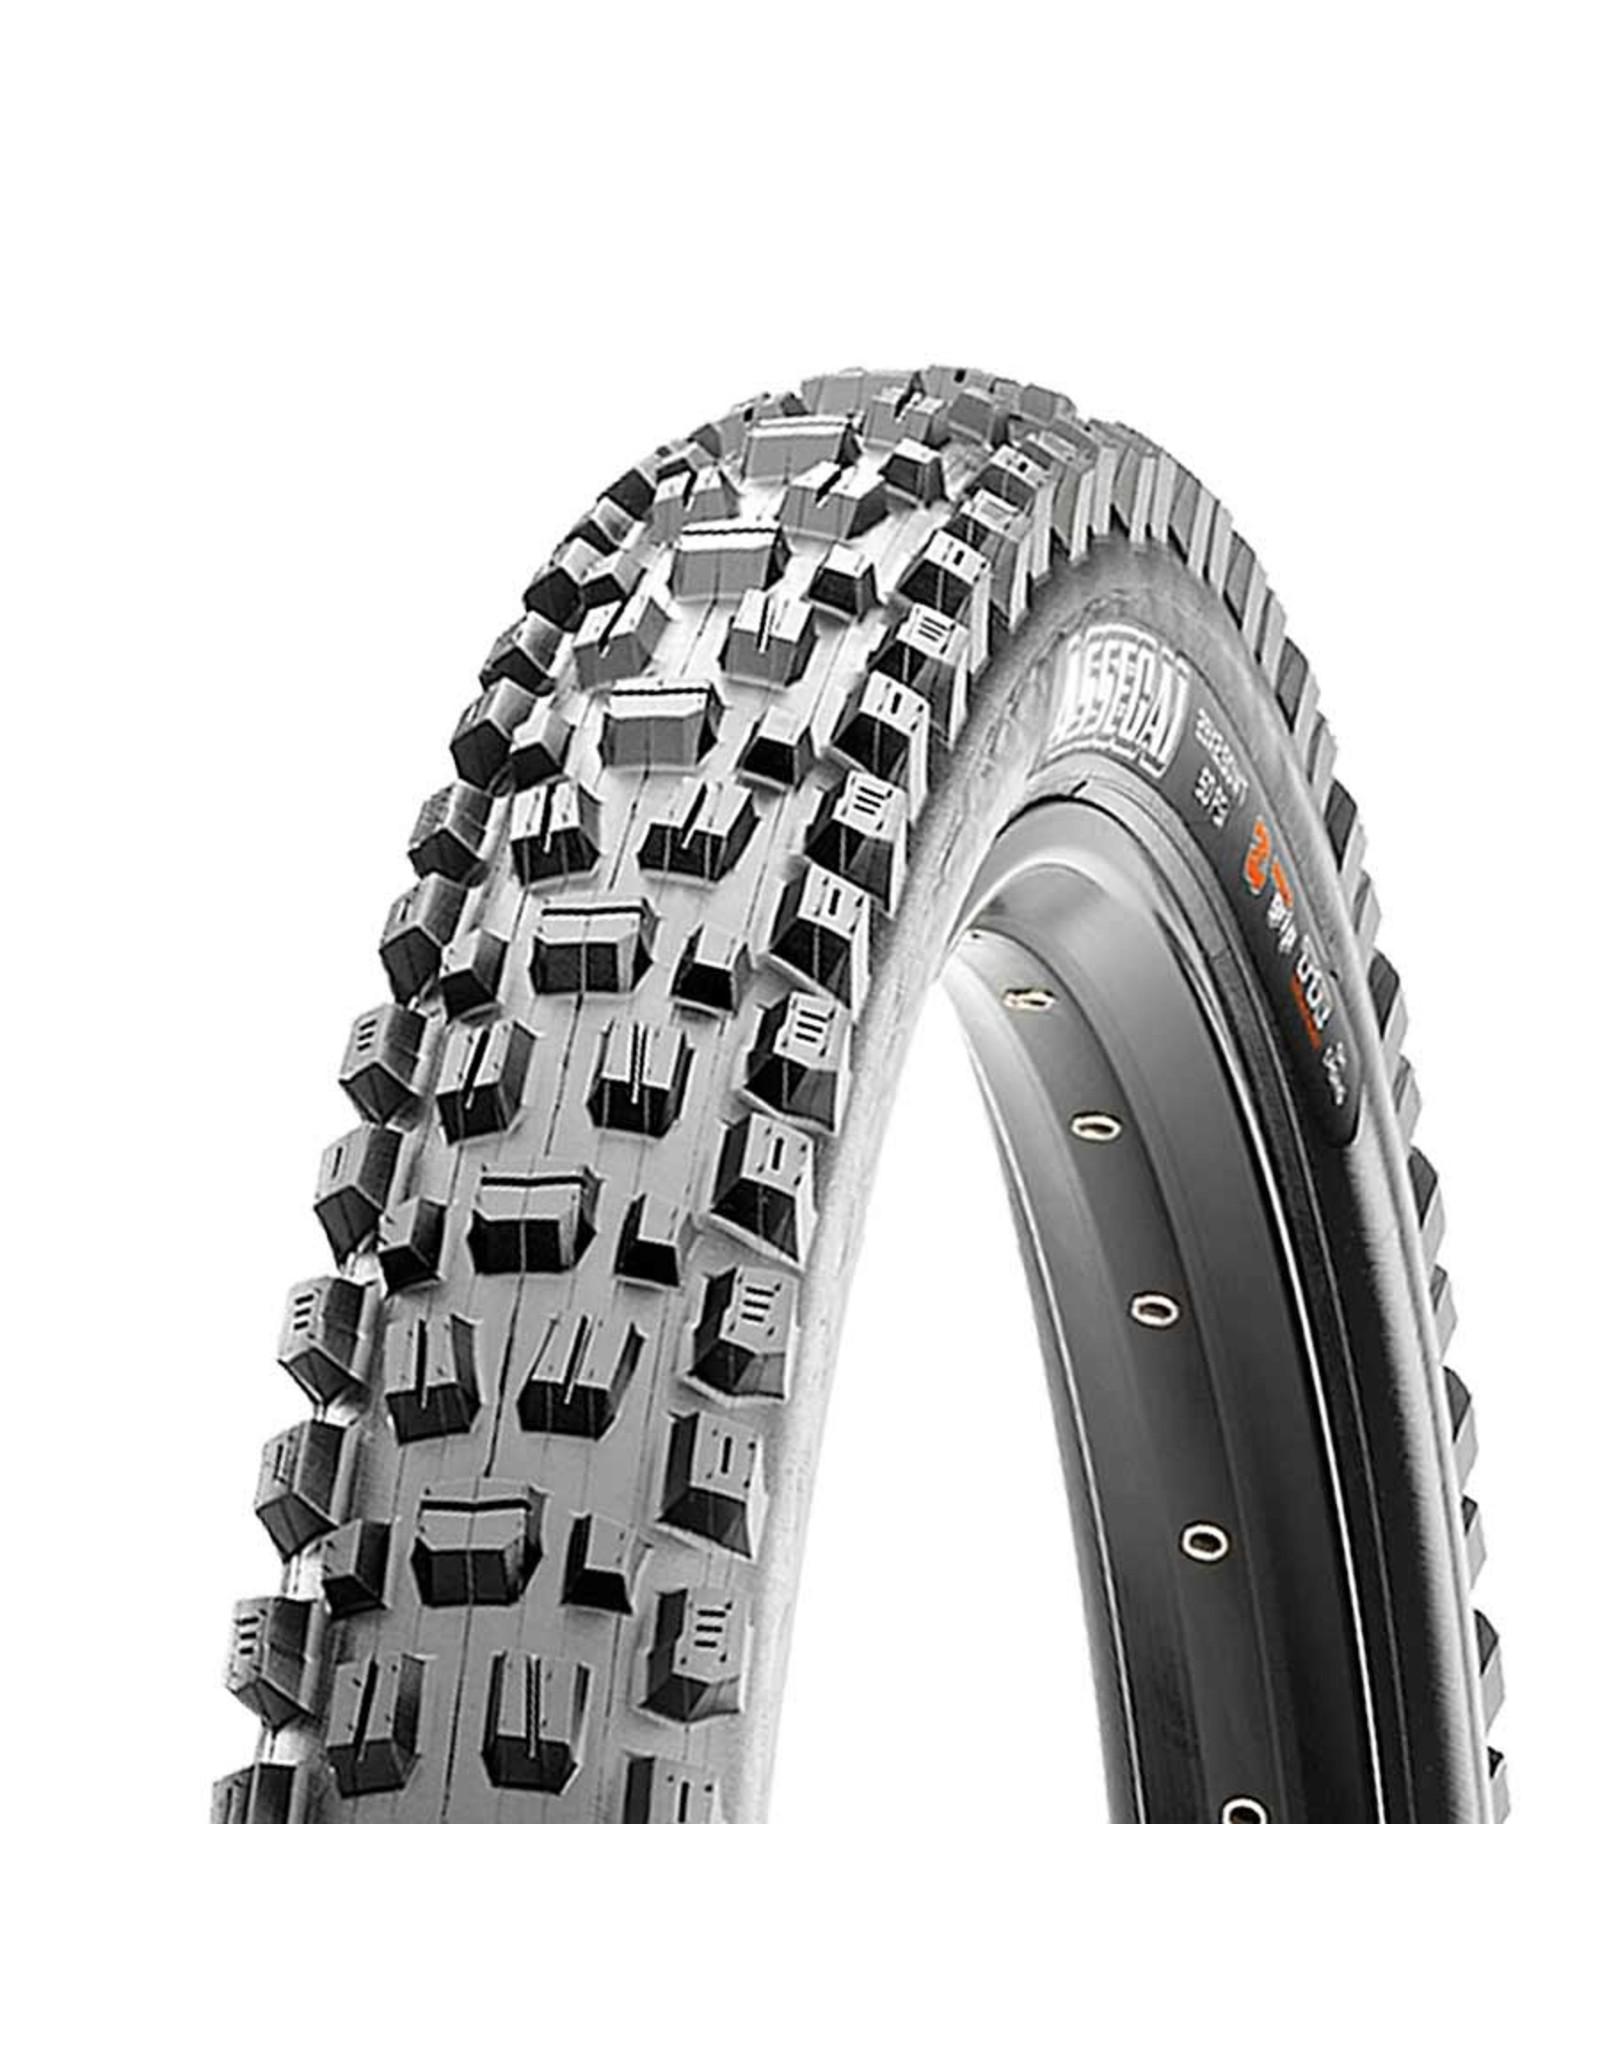 Maxxis, Assegai, Tire, 29''x2.50, Folding, Tubeless Ready, 3C Maxx Terra, EXO, Wide Trail, 60TPI, Black